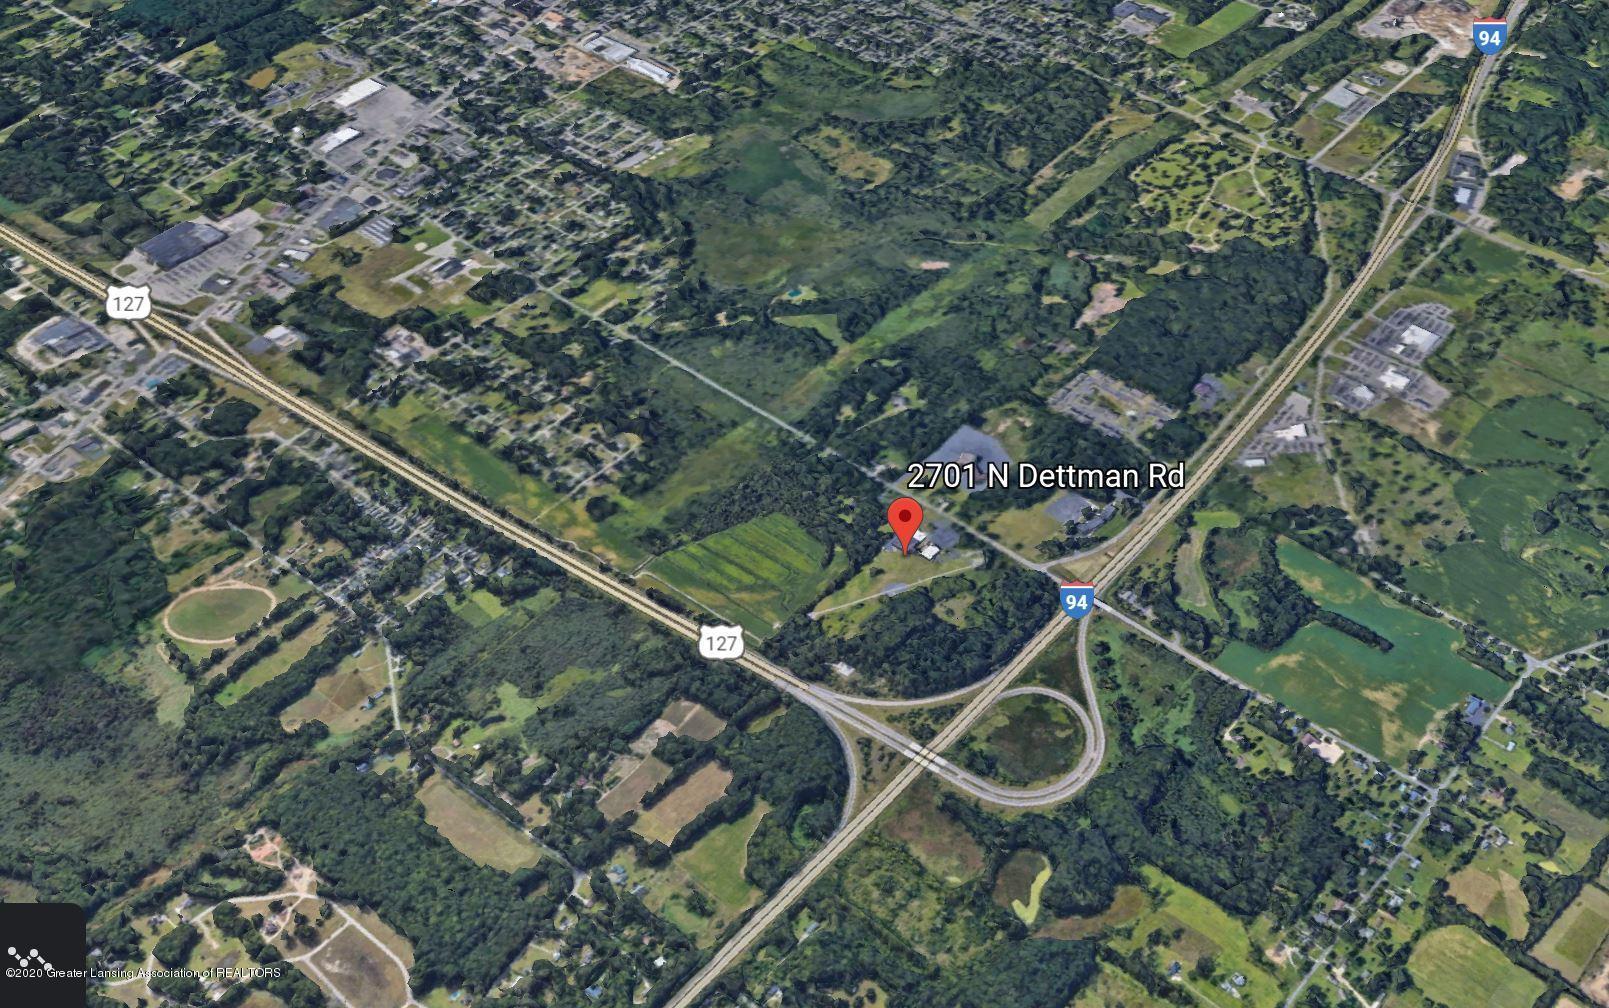 2701 N Dettman Rd - Aerial View - expanded - 2